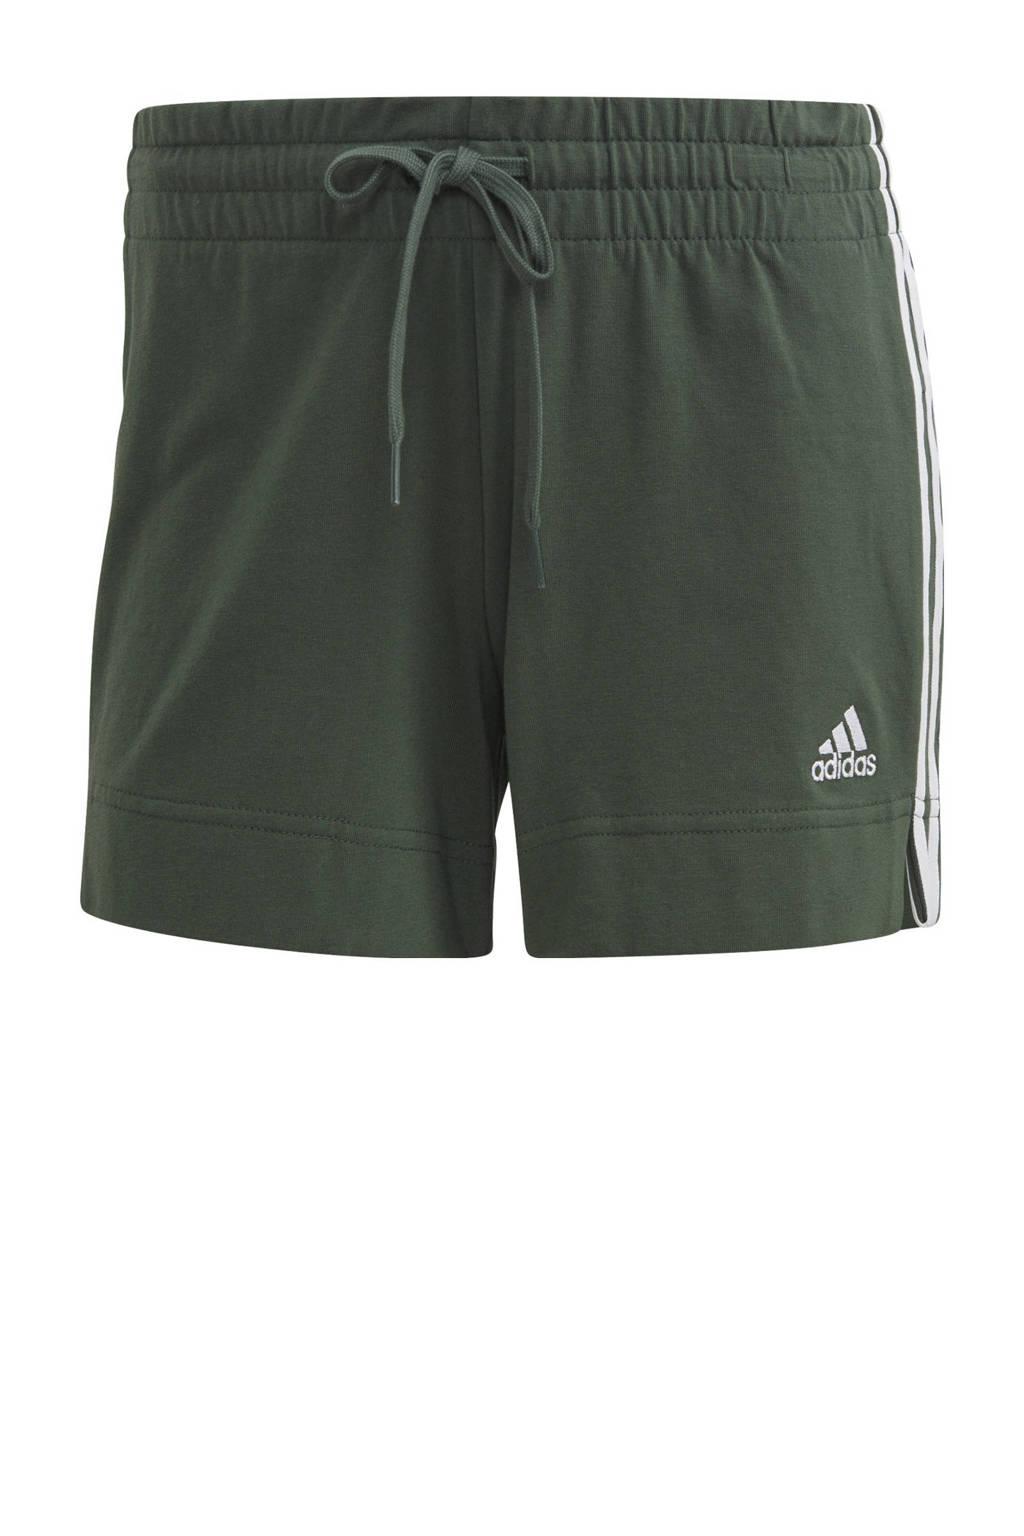 adidas Performance sportshort groen/wit, Groen/wit